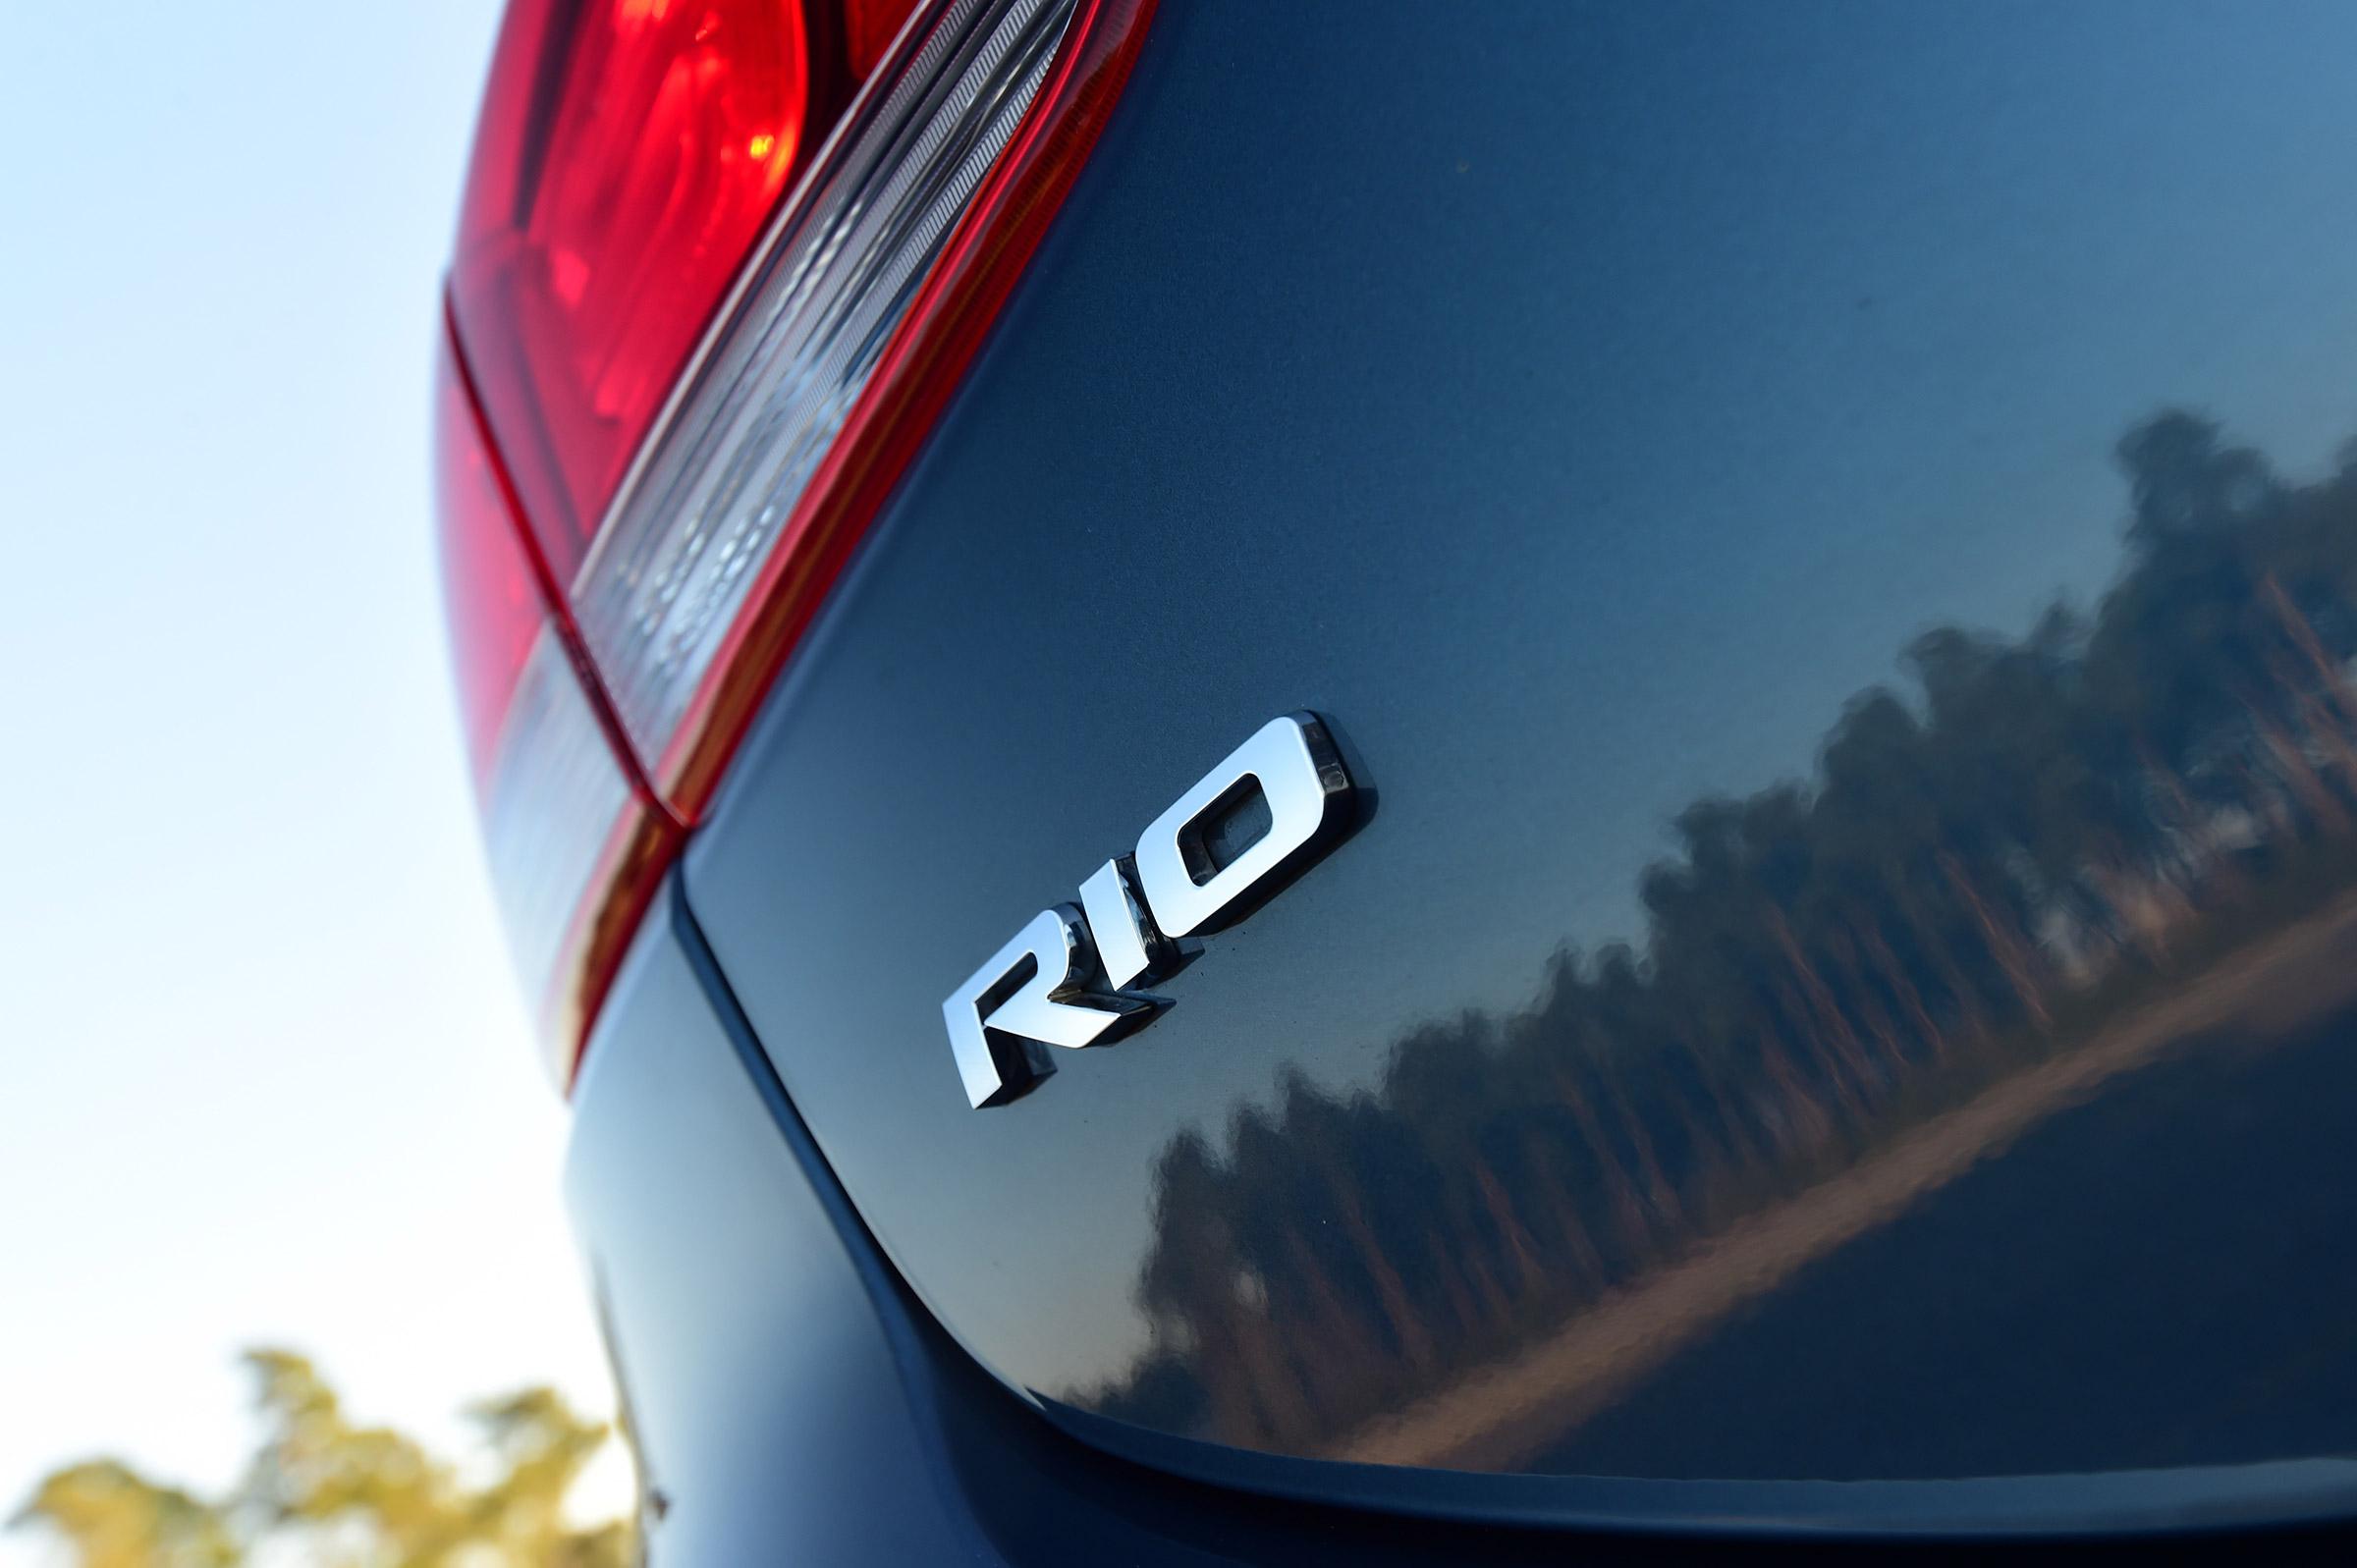 2017 Kia Rio Exterior View Rear Emblem (Photo 9 of 49)